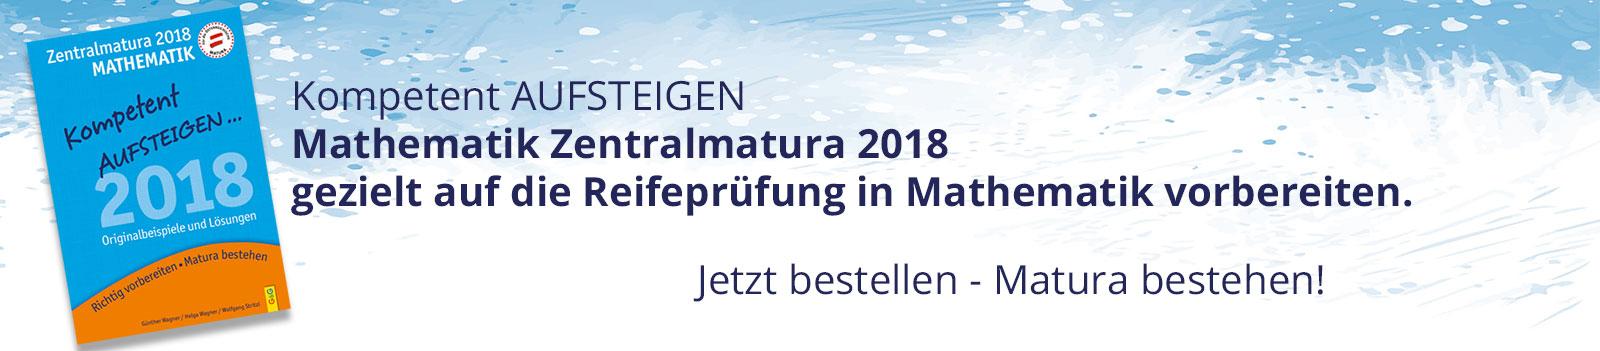 Zentralmatura-2018